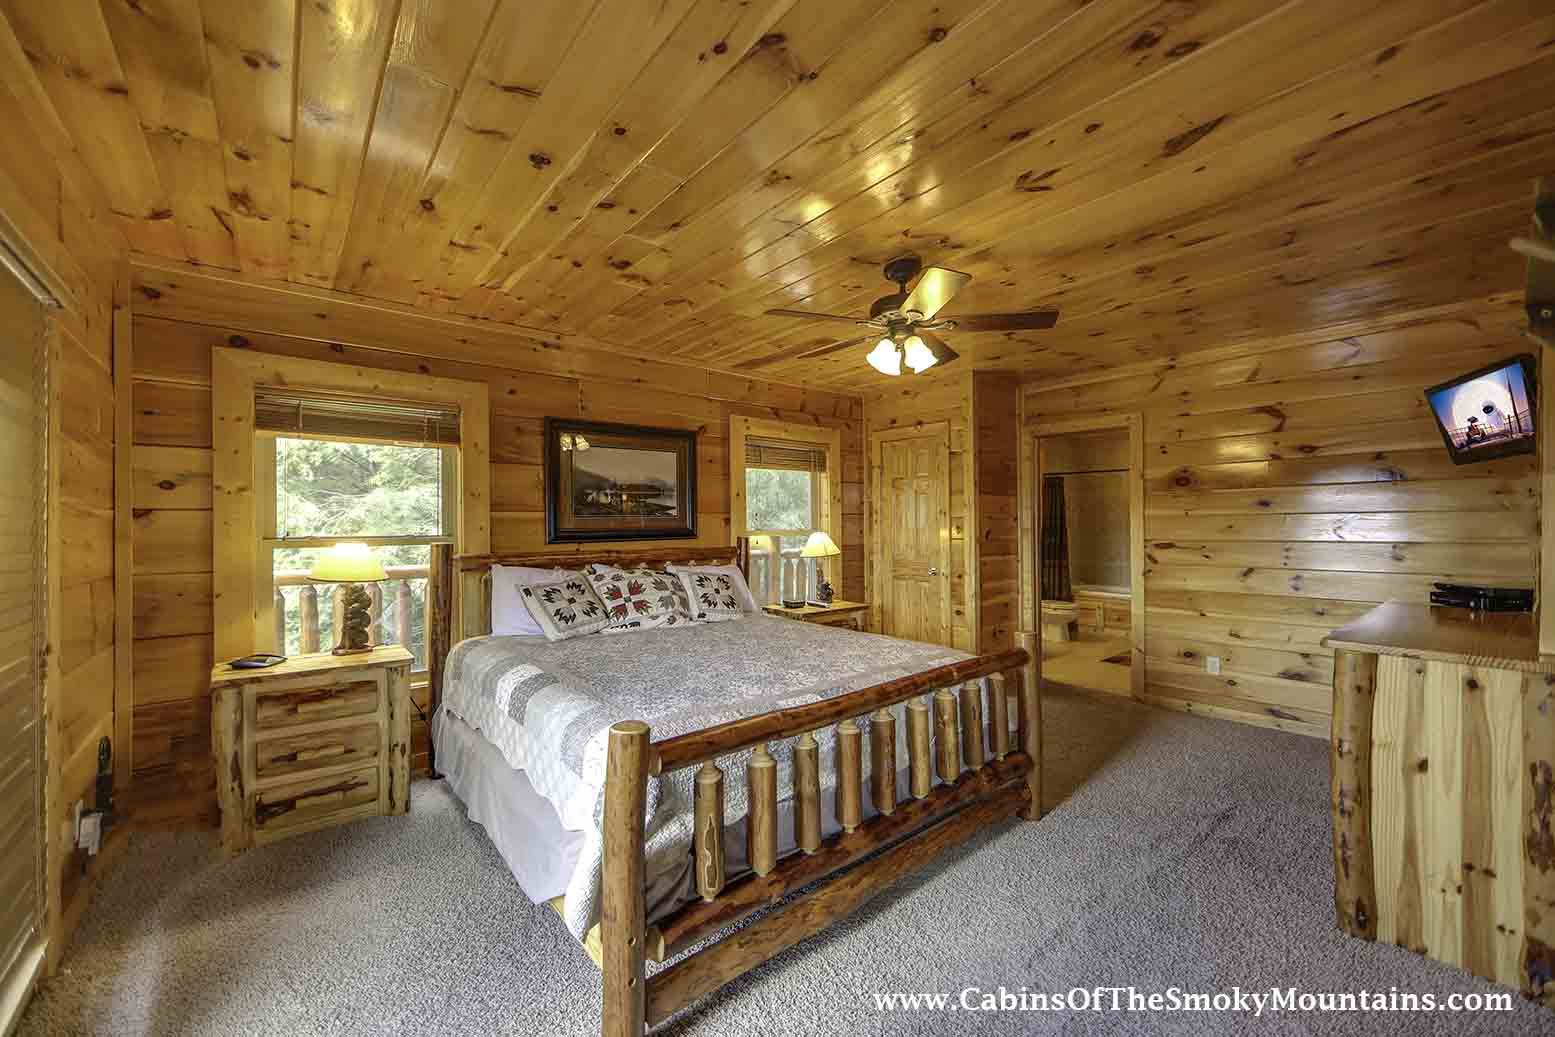 gatlinburg cabin vista lodge 6 bedroom sleeps 22 jacuzzi